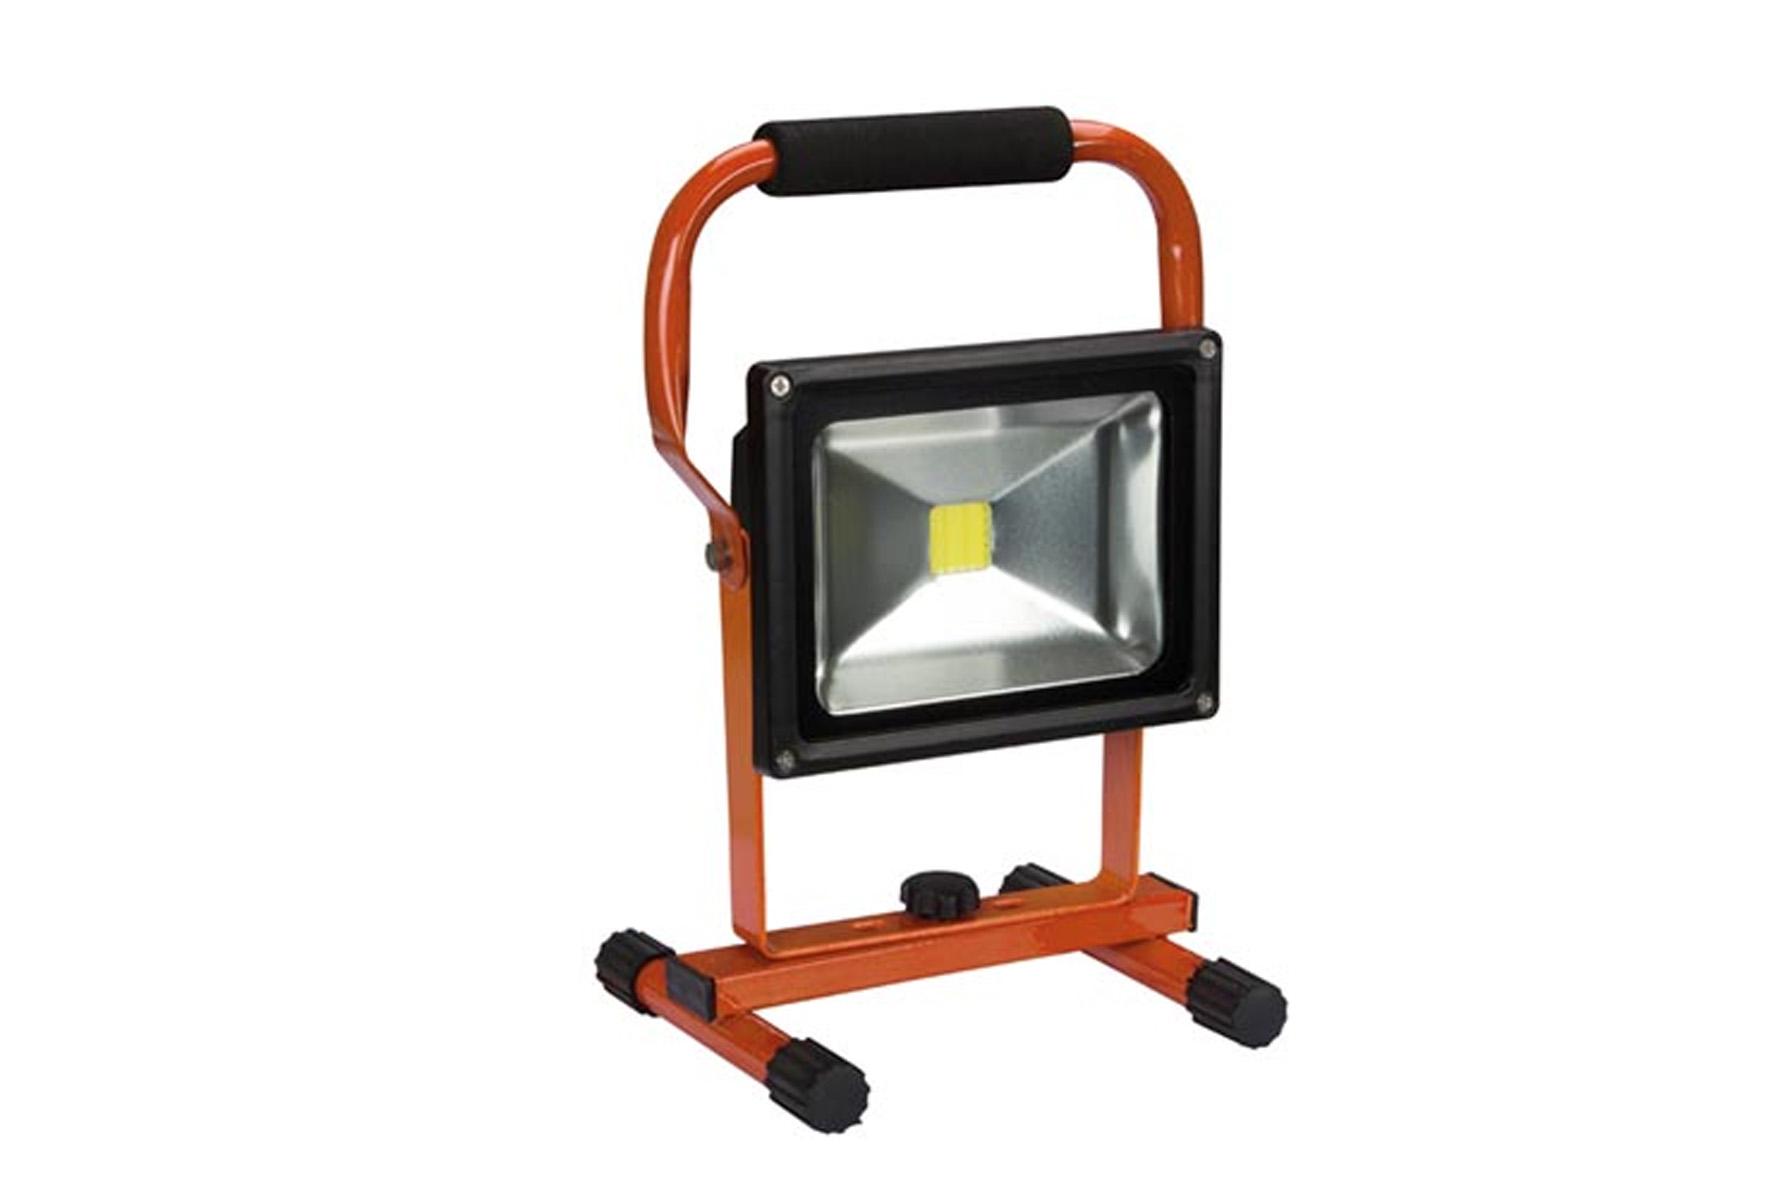 Portatif 20w Chantier De Perel Rechargeable Lampe Led ZTkPuOXi